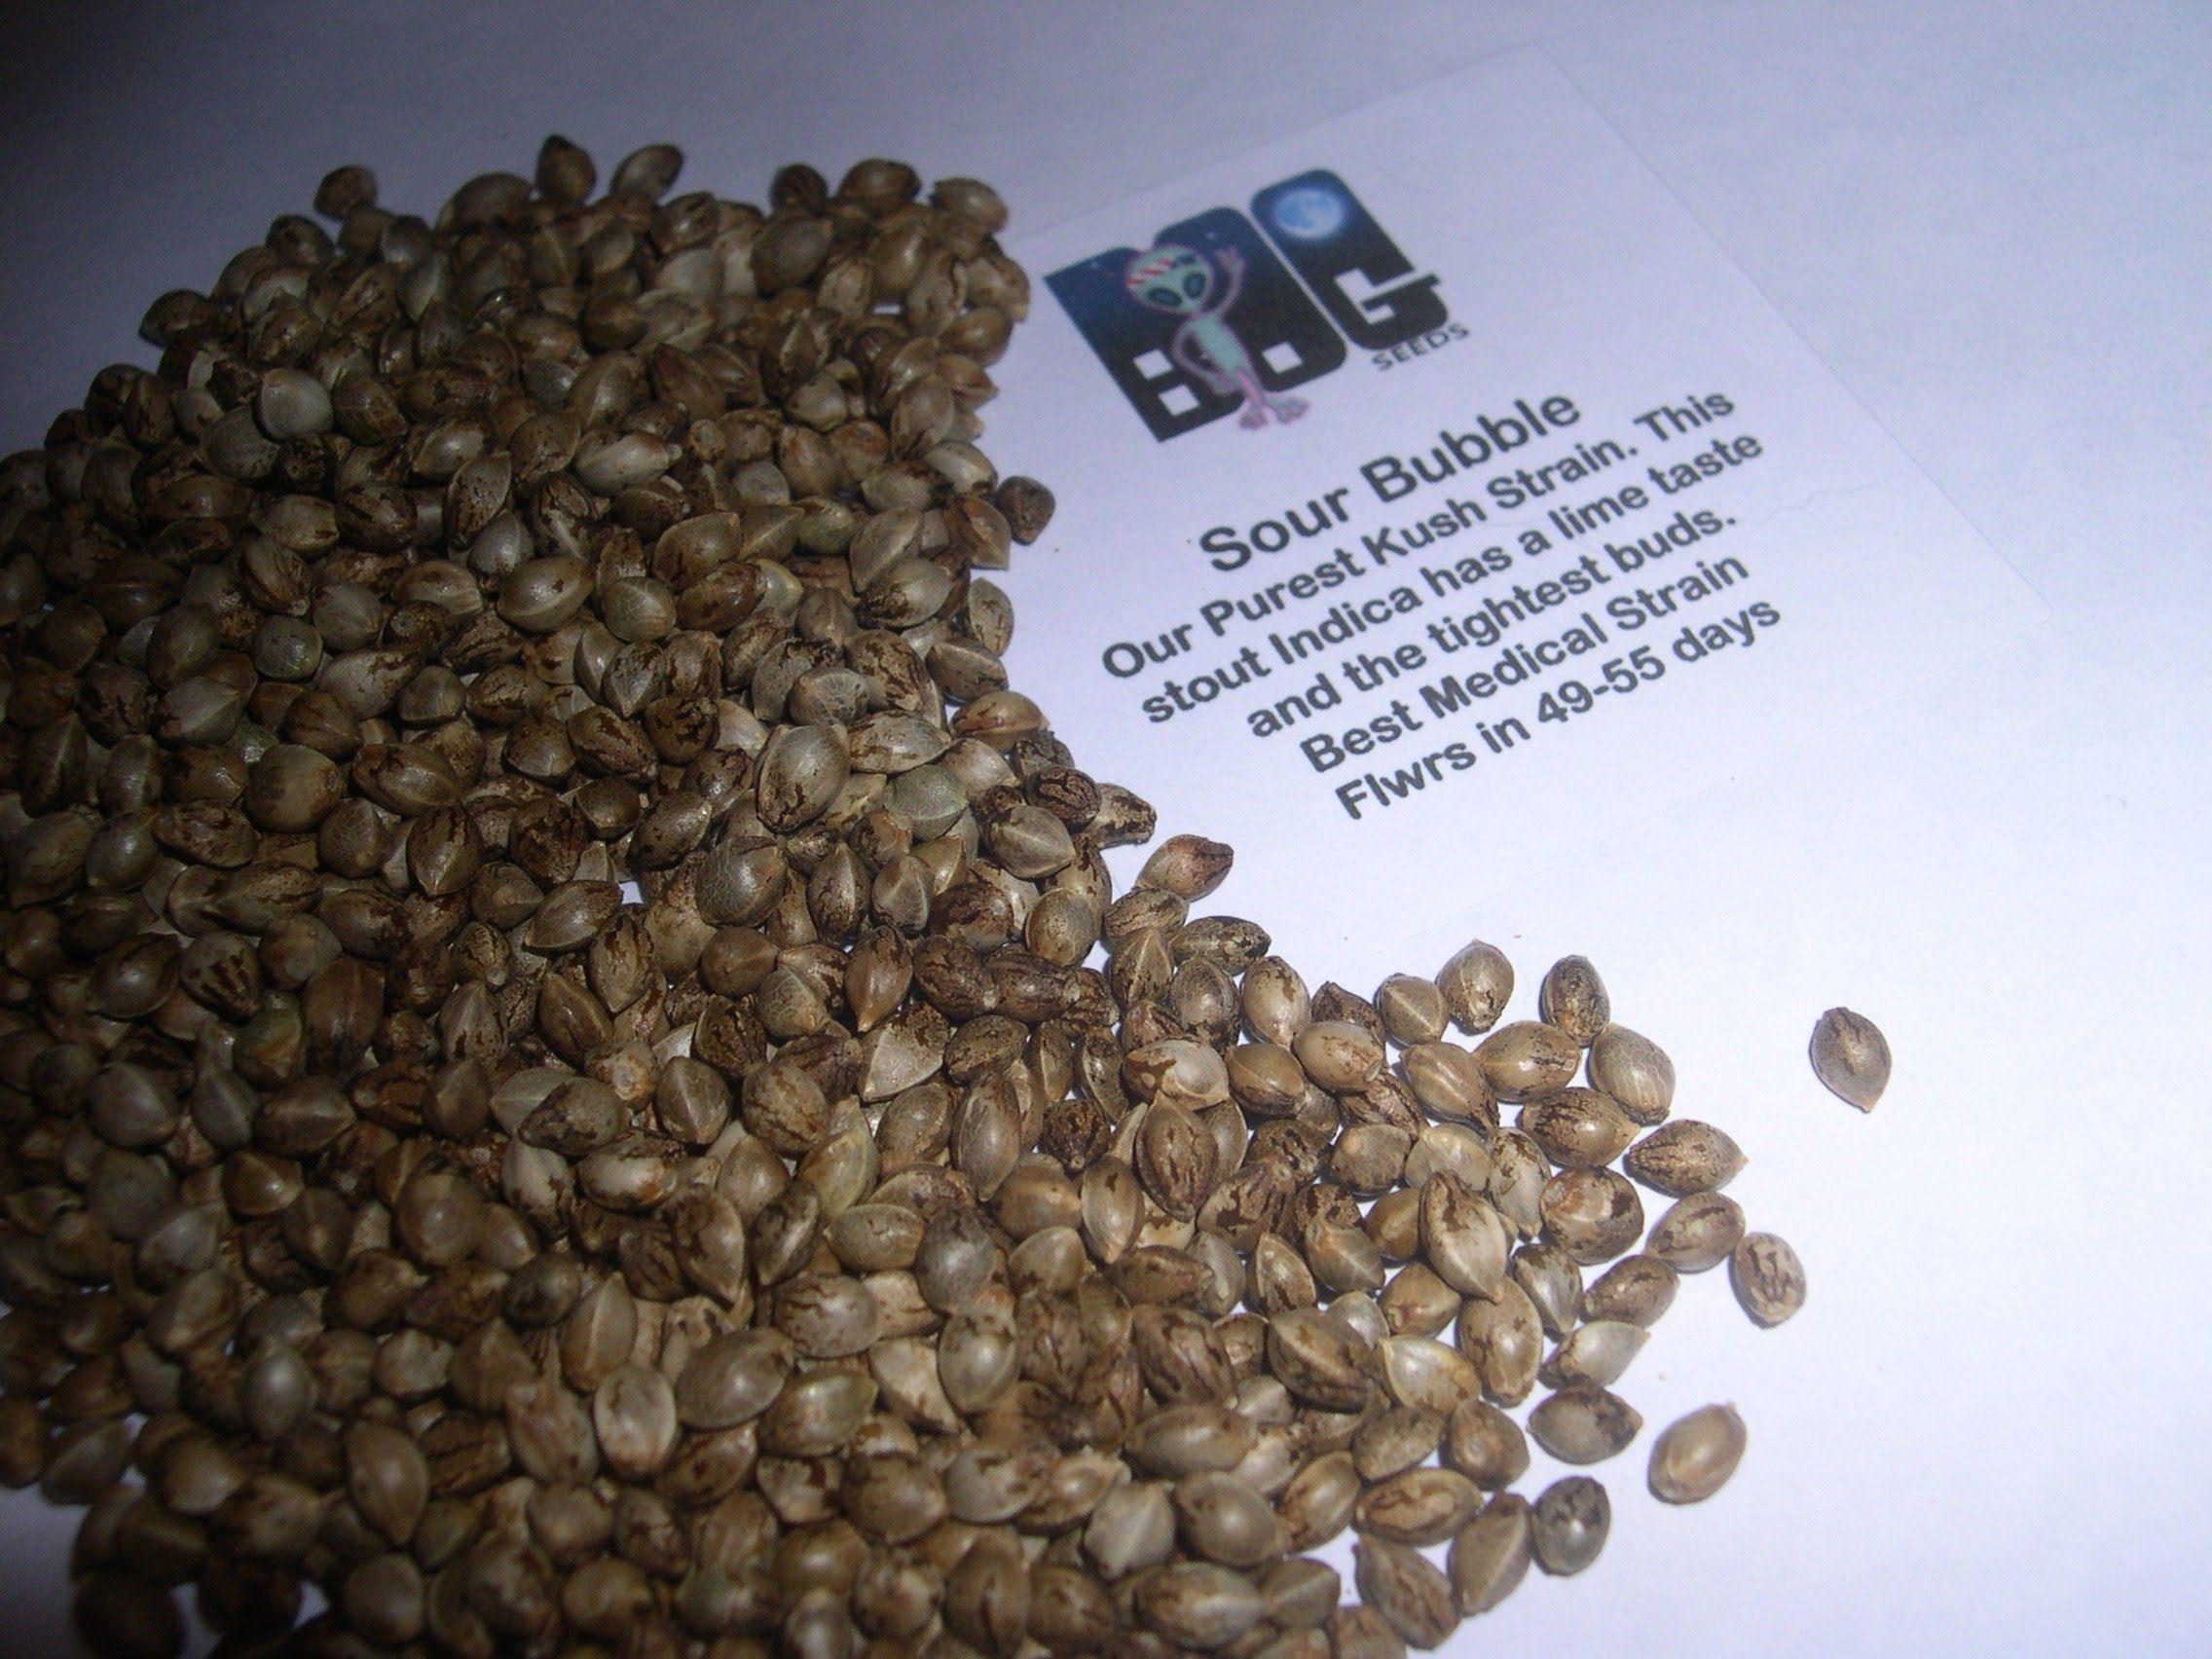 Sour Bubble 13 Regular Seeds